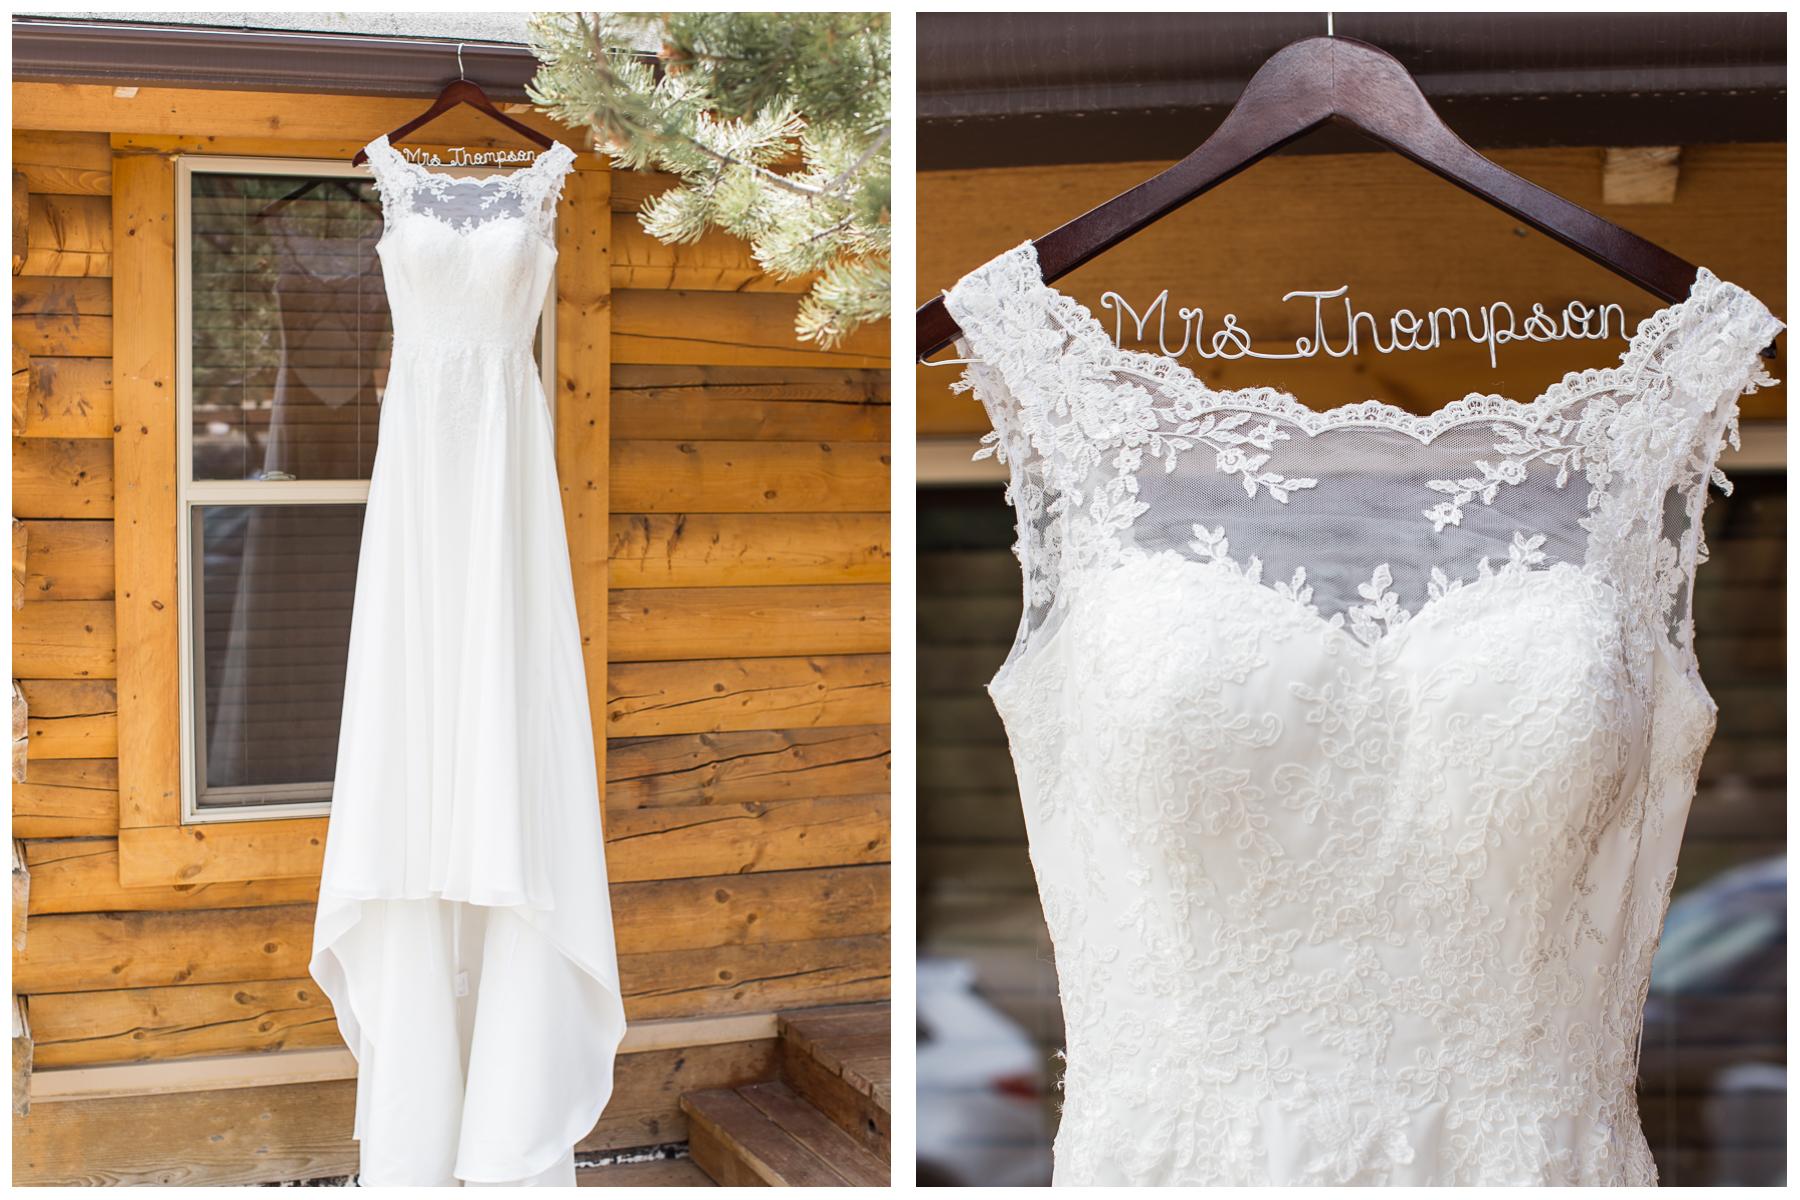 Thompson Wedding 1.jpg